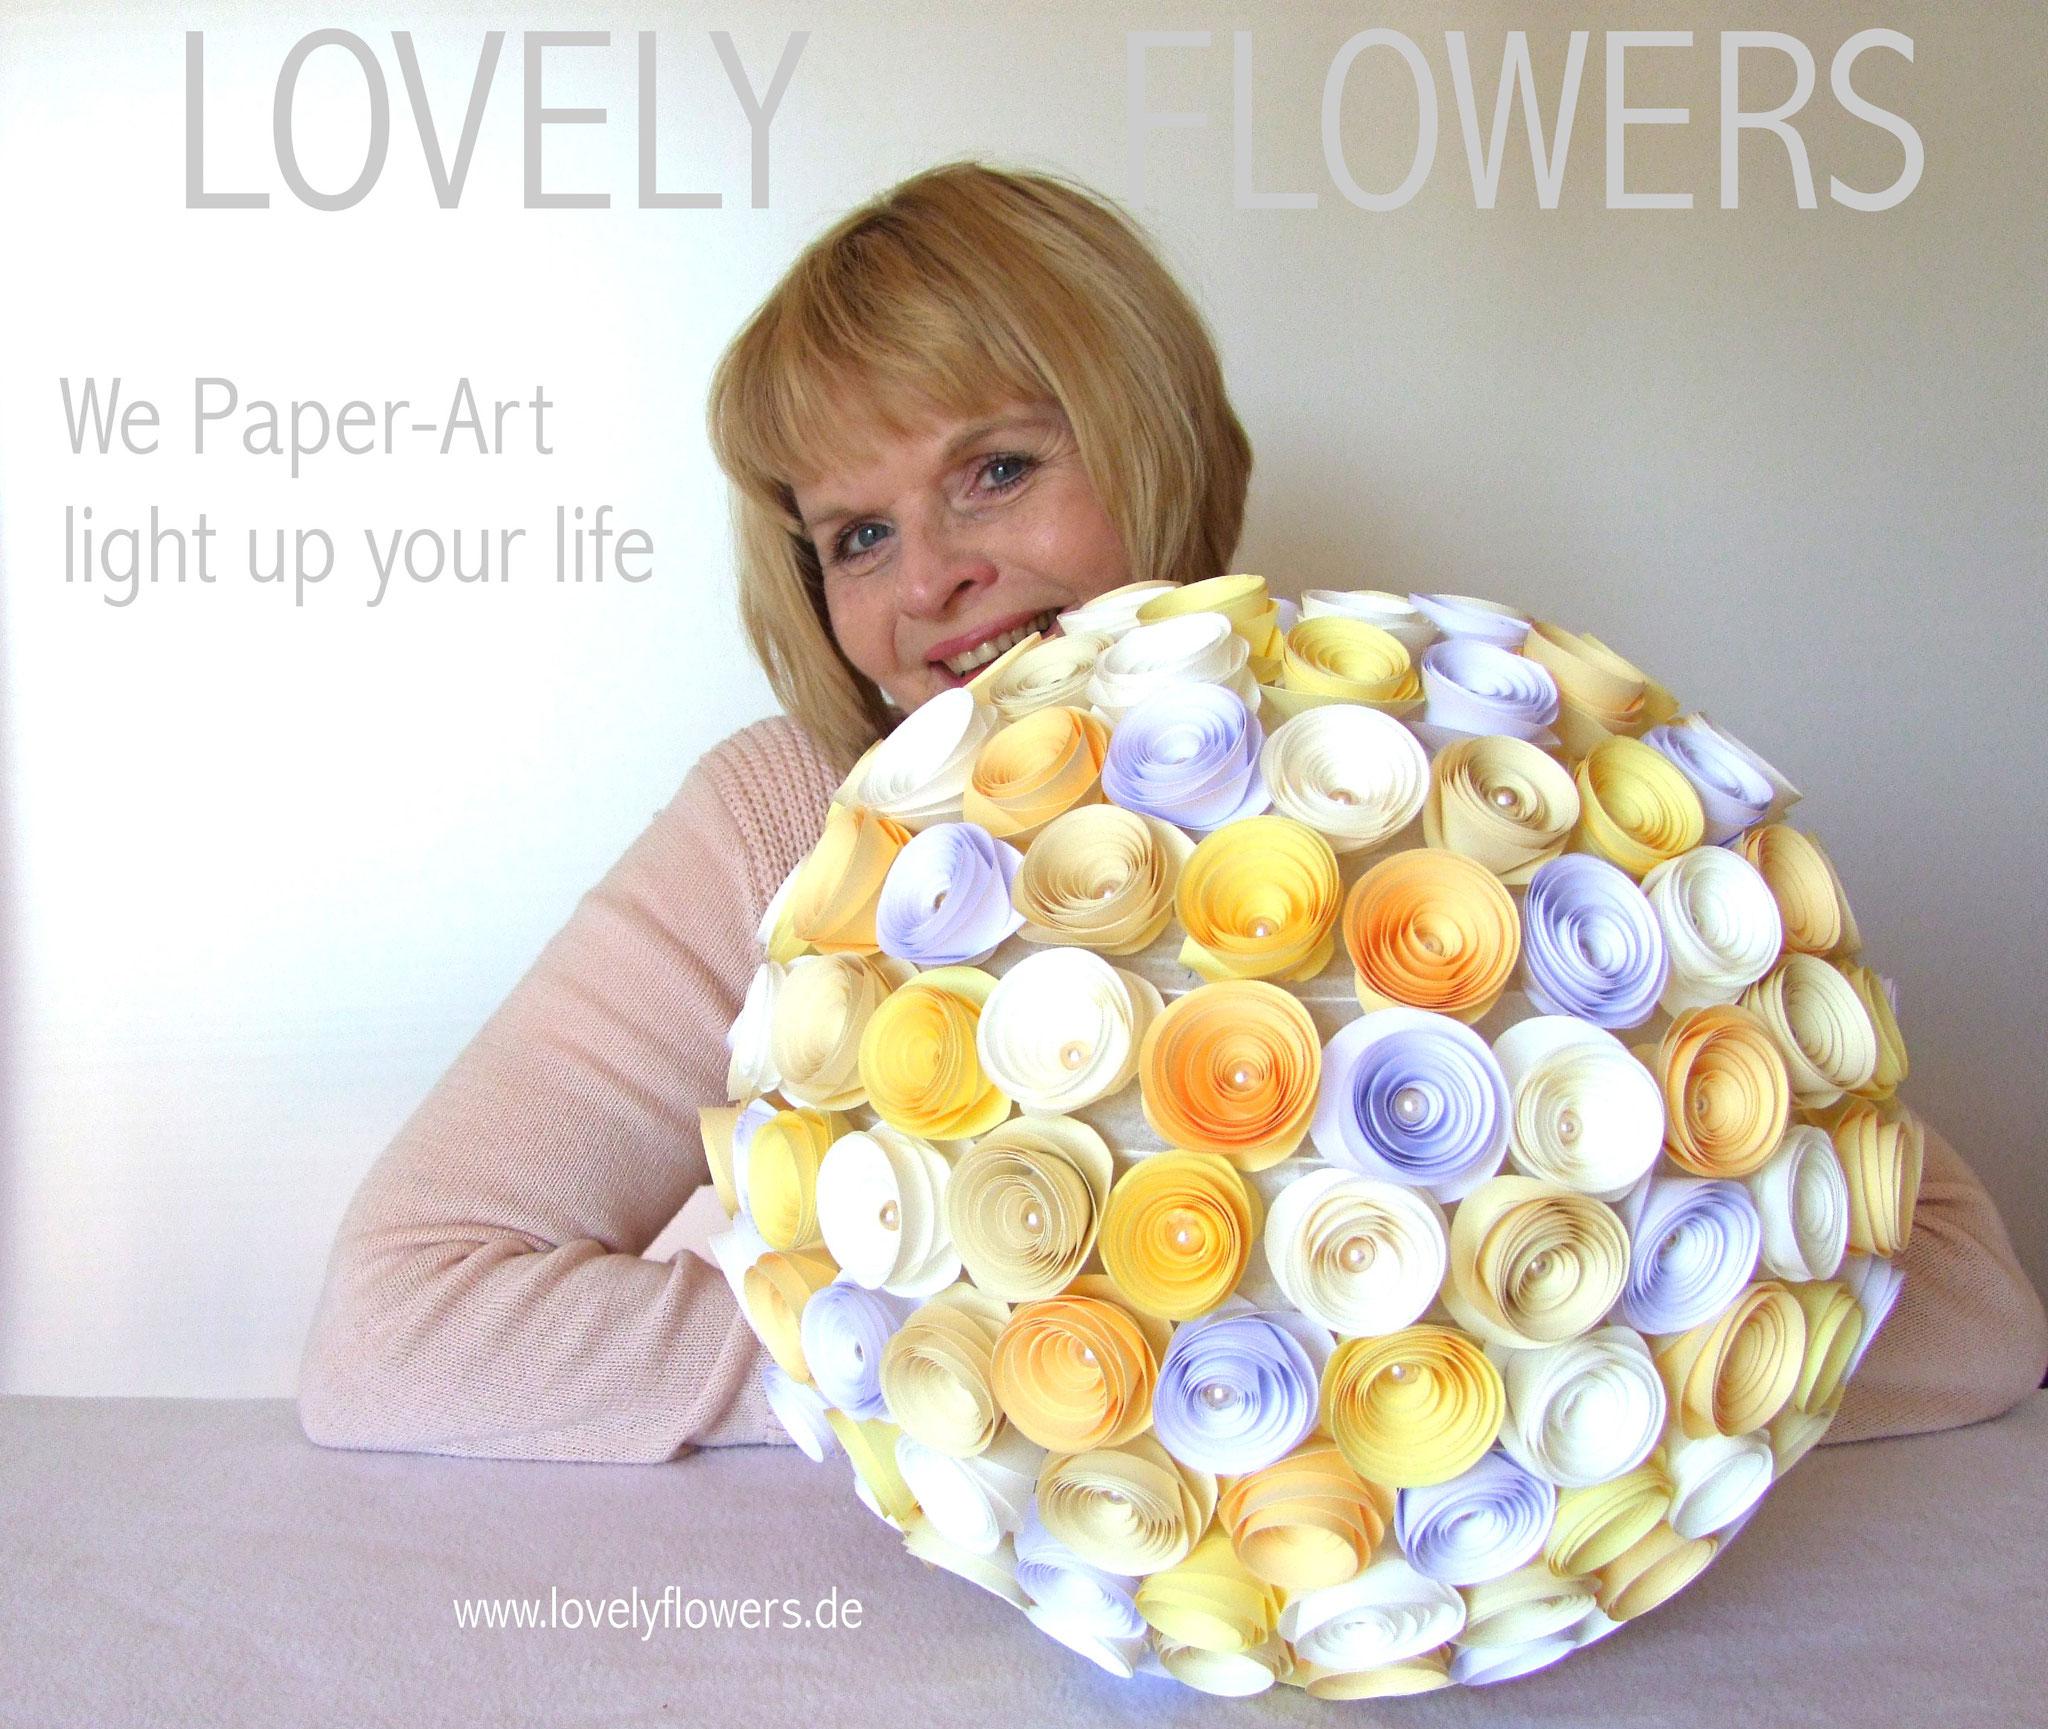 www.lovelyflowers.de - Paper Art Lampen gibts auch in imposanter Größe!